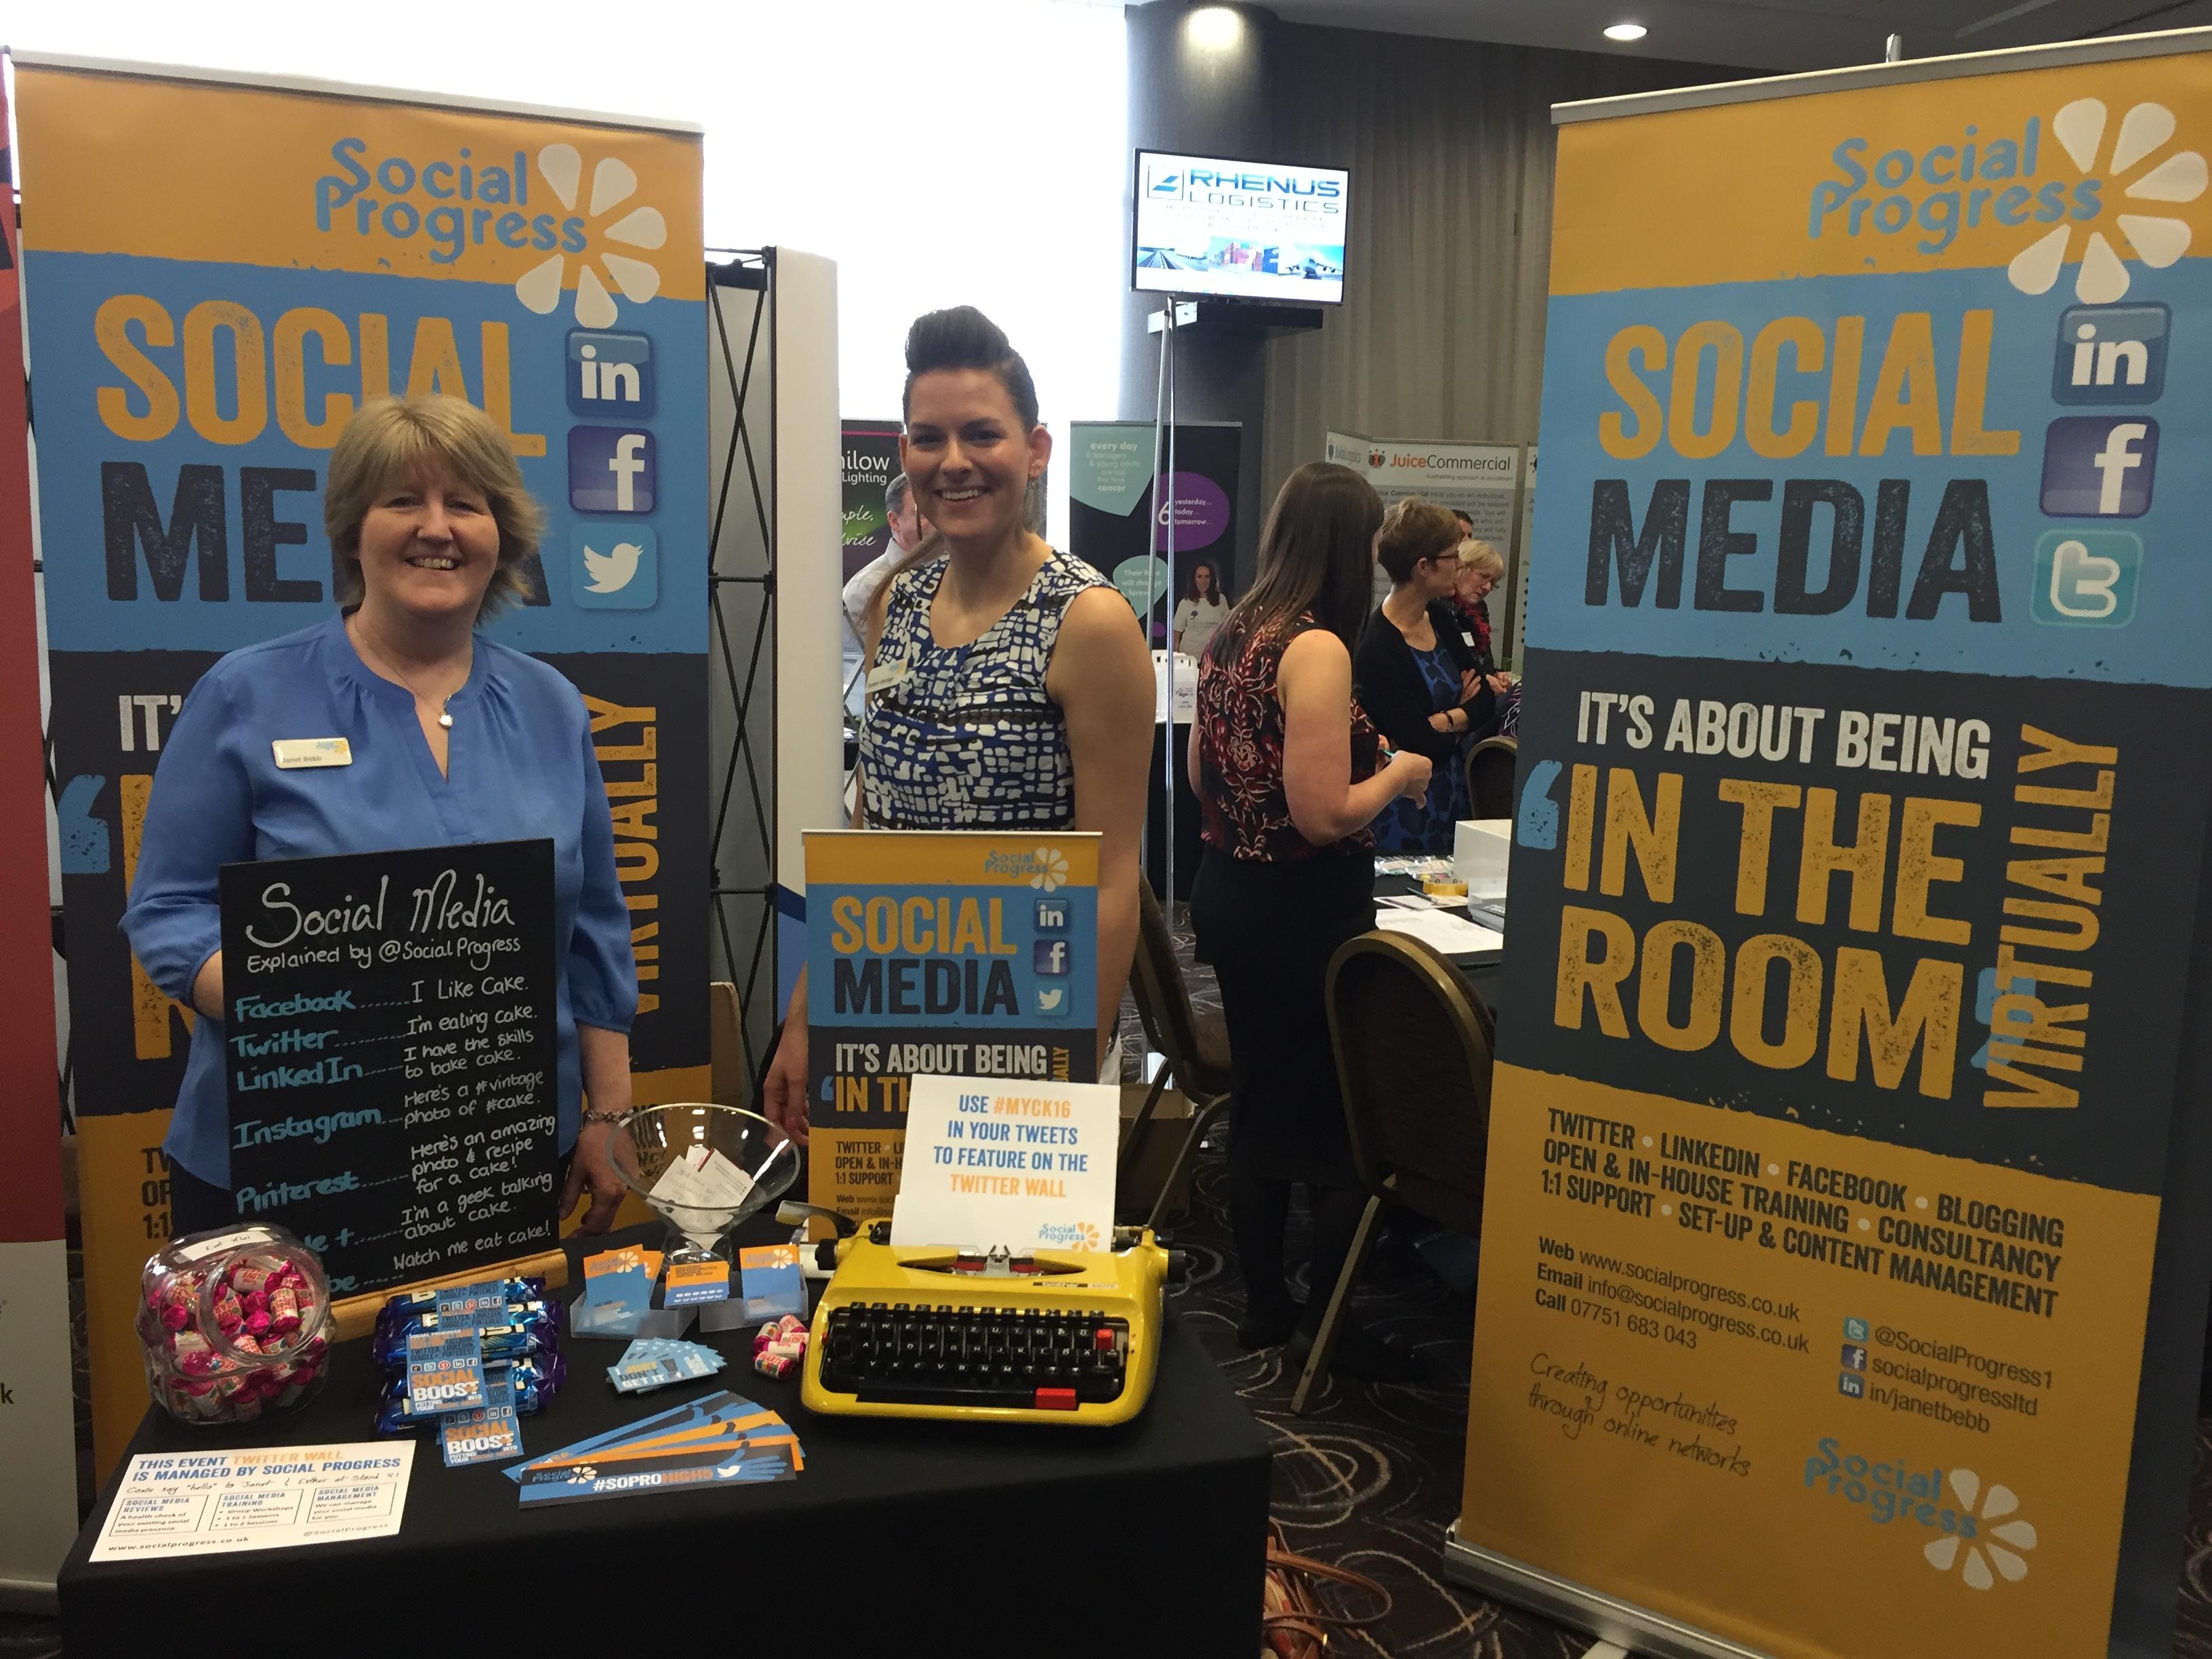 Social Progress Ltd - Kirklees Business Conference #MYCK16 - Mid Yorkshire Chamber of Commerce - Janet Bebb and Esther Orridge